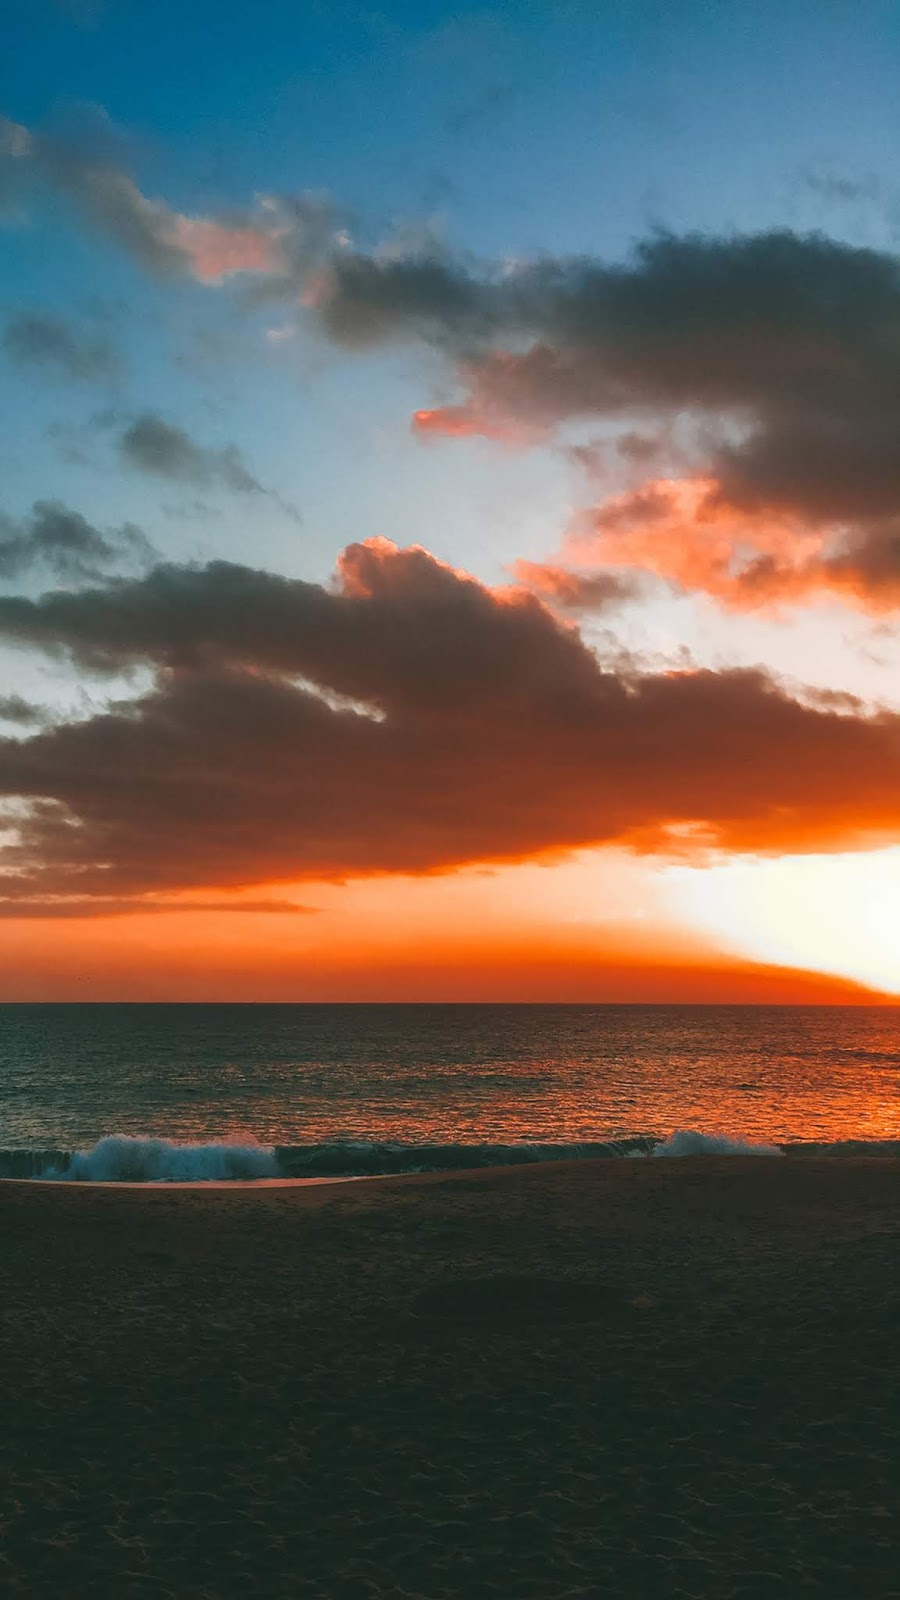 Sunset in the beach wallpaper